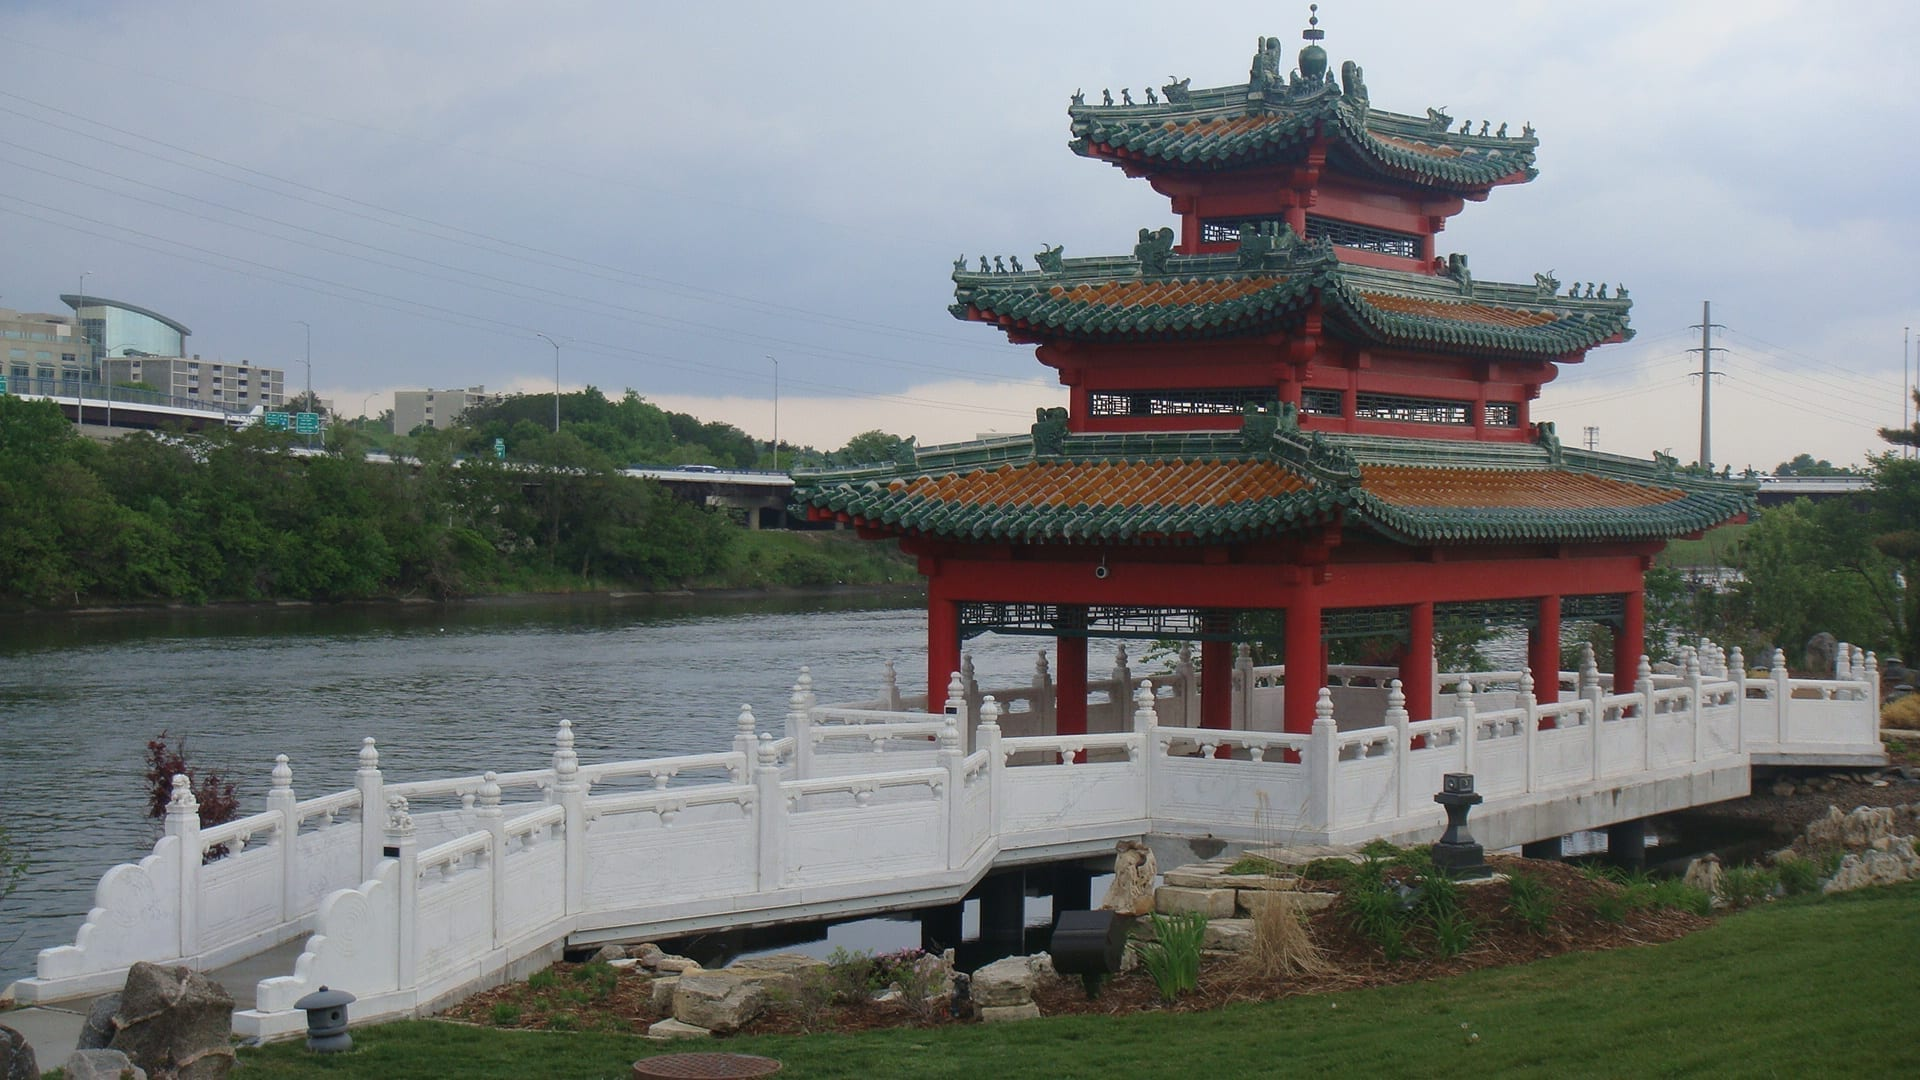 Robert D. Ray Asian Gardens a lo largo del río Des Moines Des Moines (Iowa) Estados Unidos